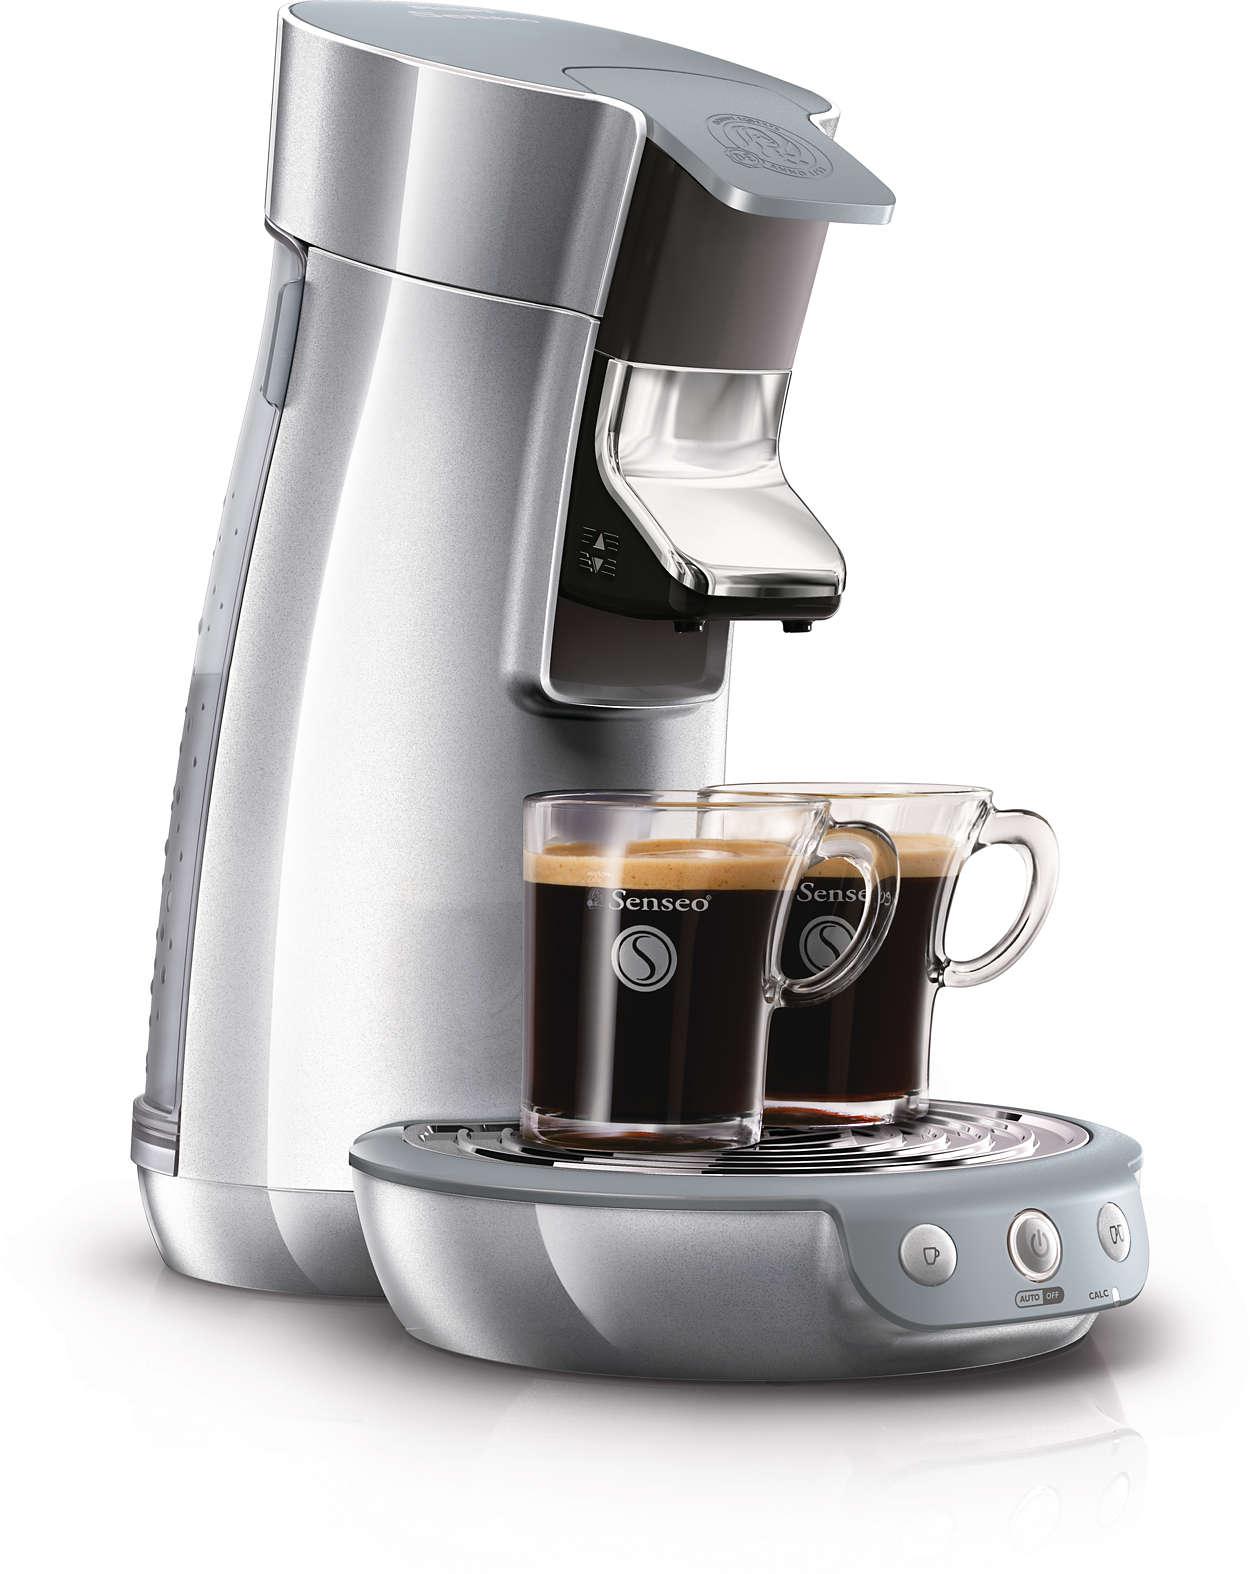 Skani kava vienu mygtuko palietimu